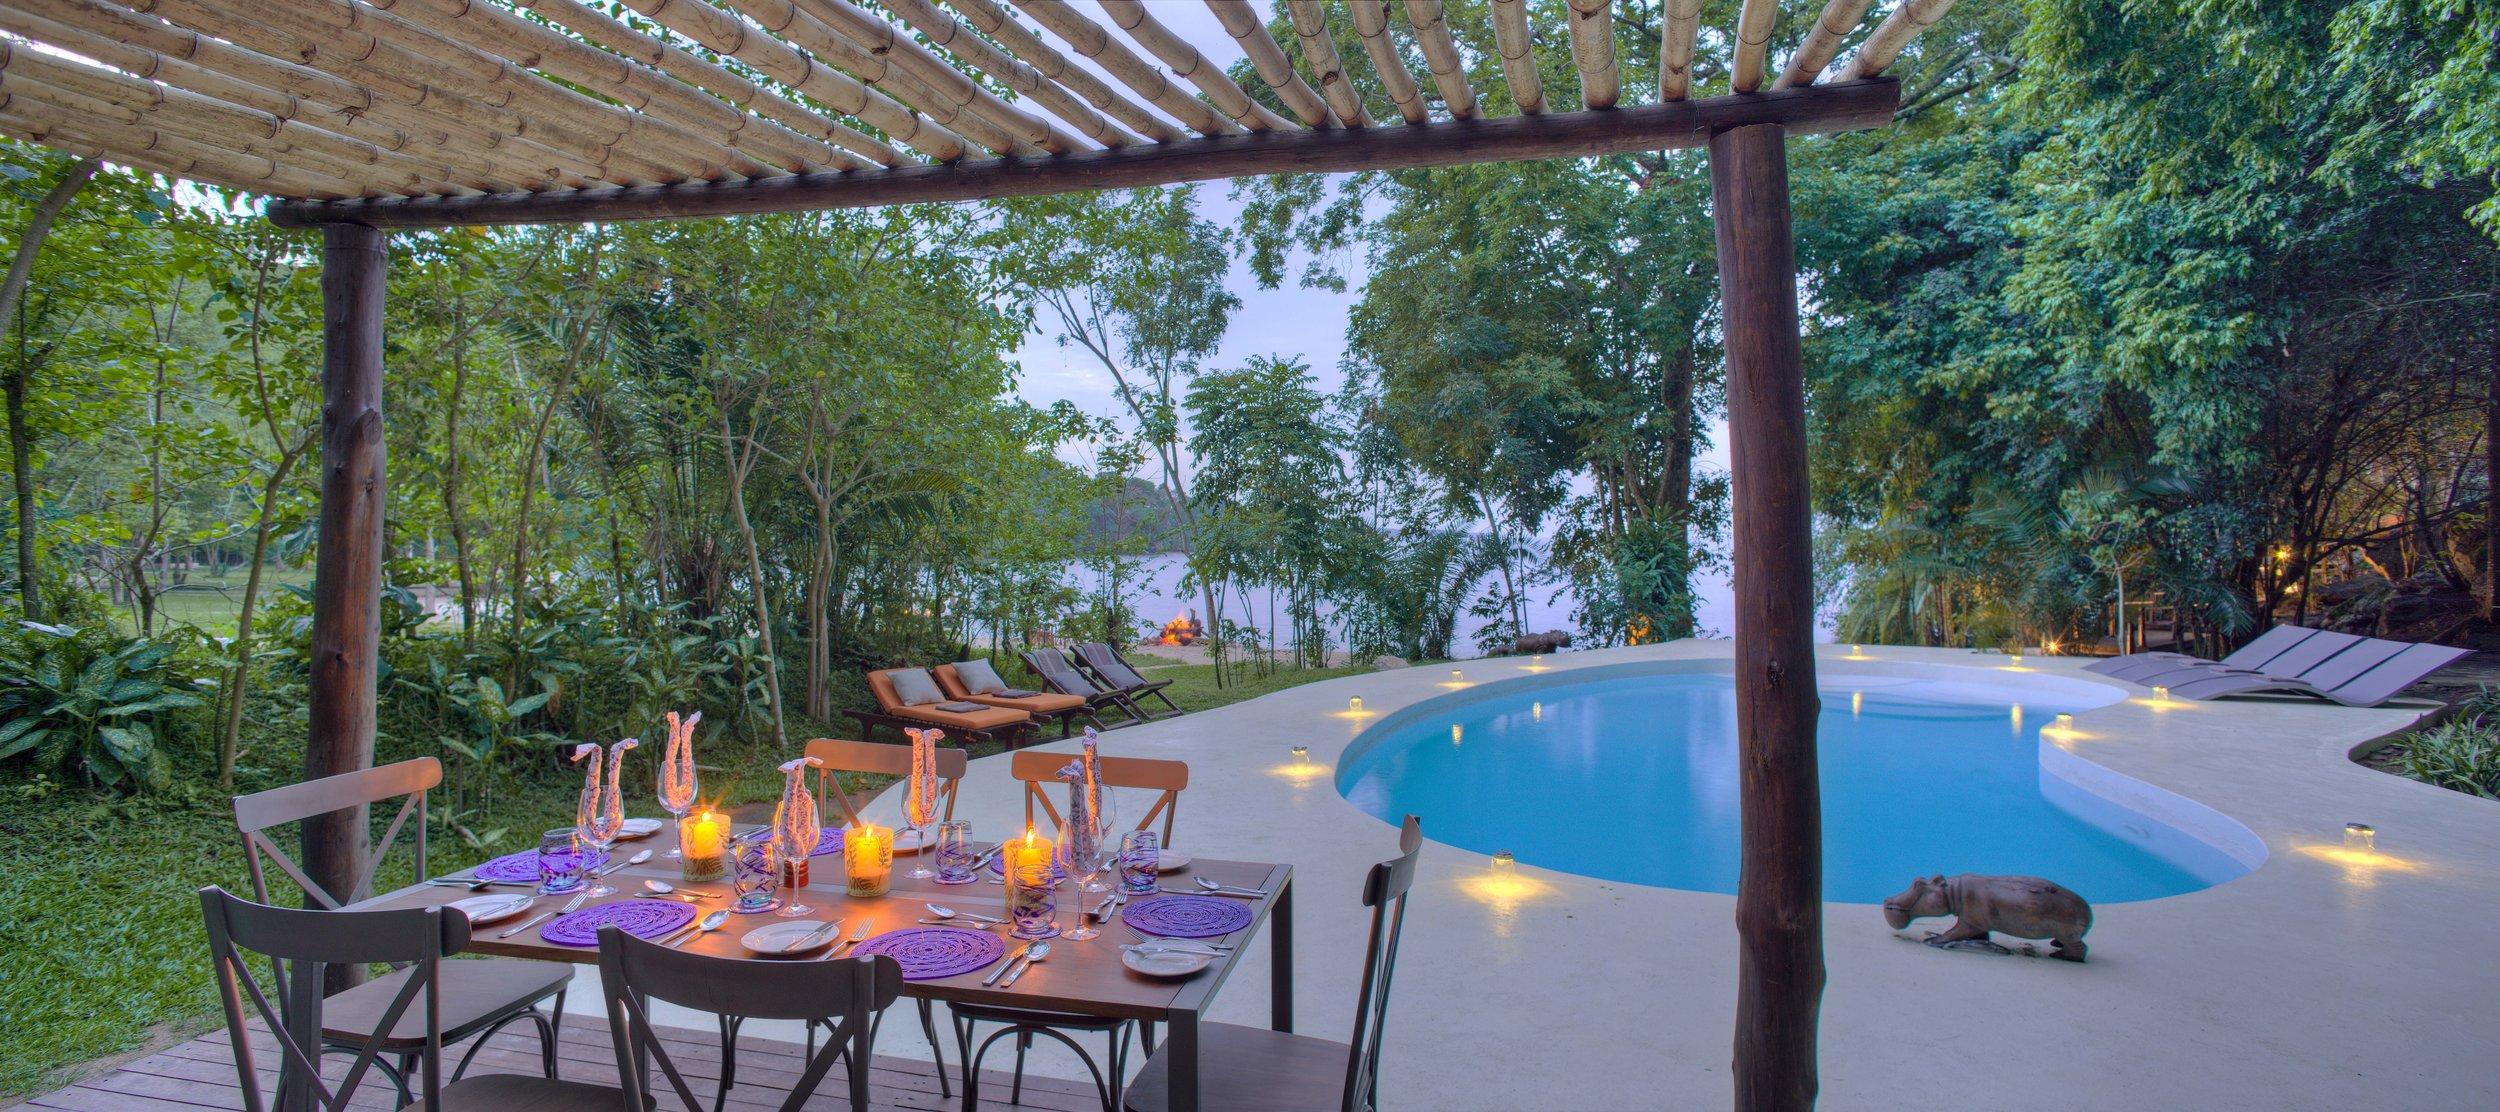 Rubondo-Island-Private-dining-set-up-around-the-pool-overlooking-Lake-Victoria.jpg